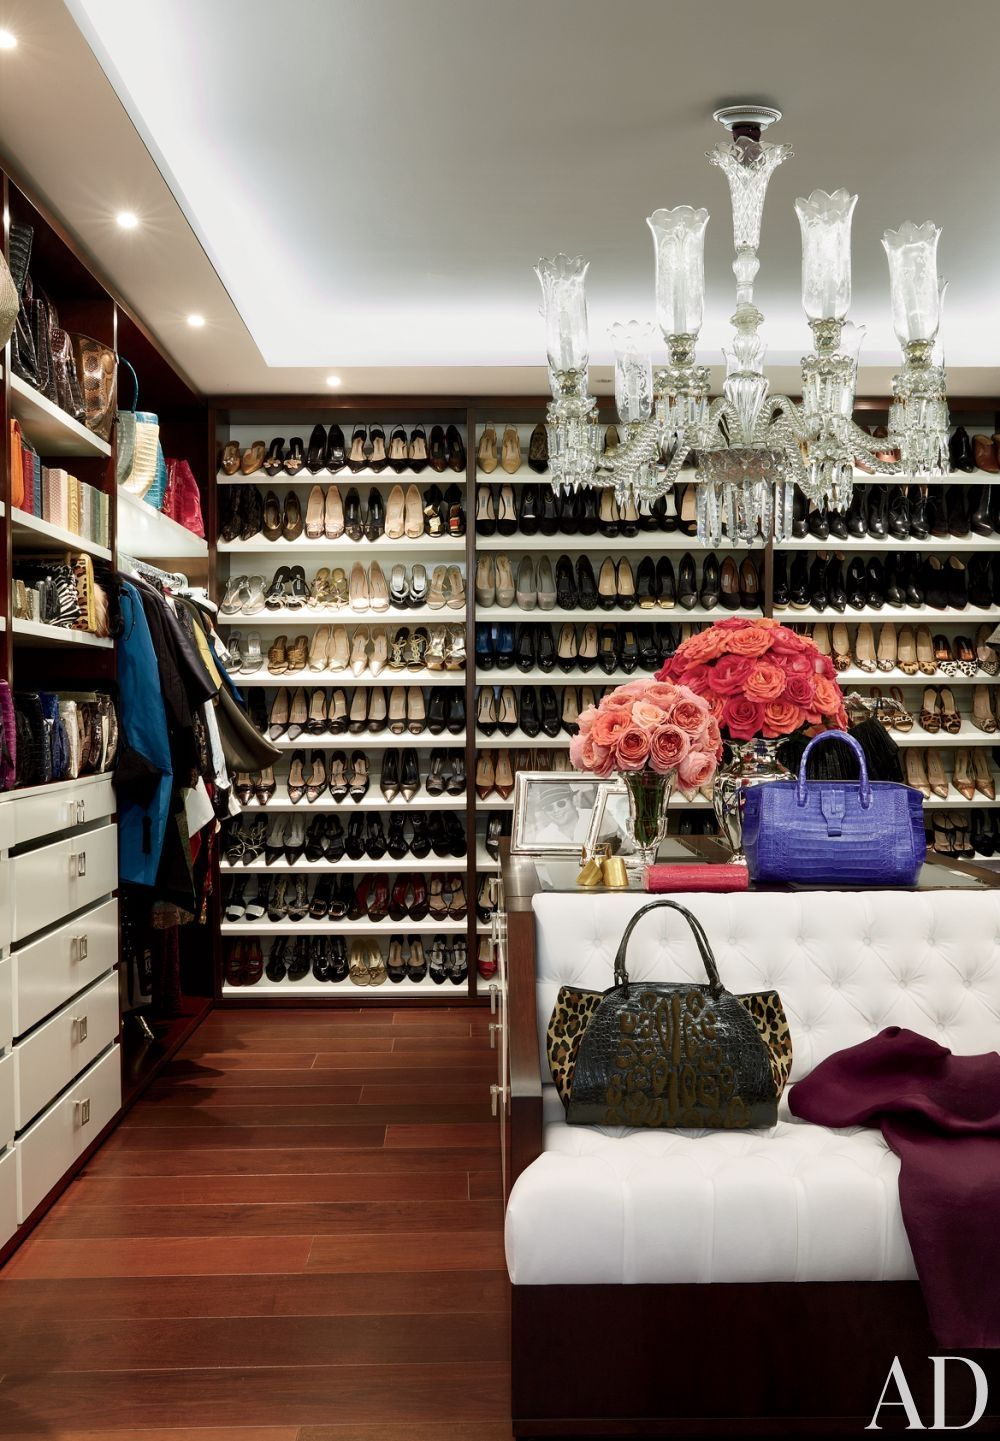 GLAMOROUS CLOSET DESIGNS stunning closet space with